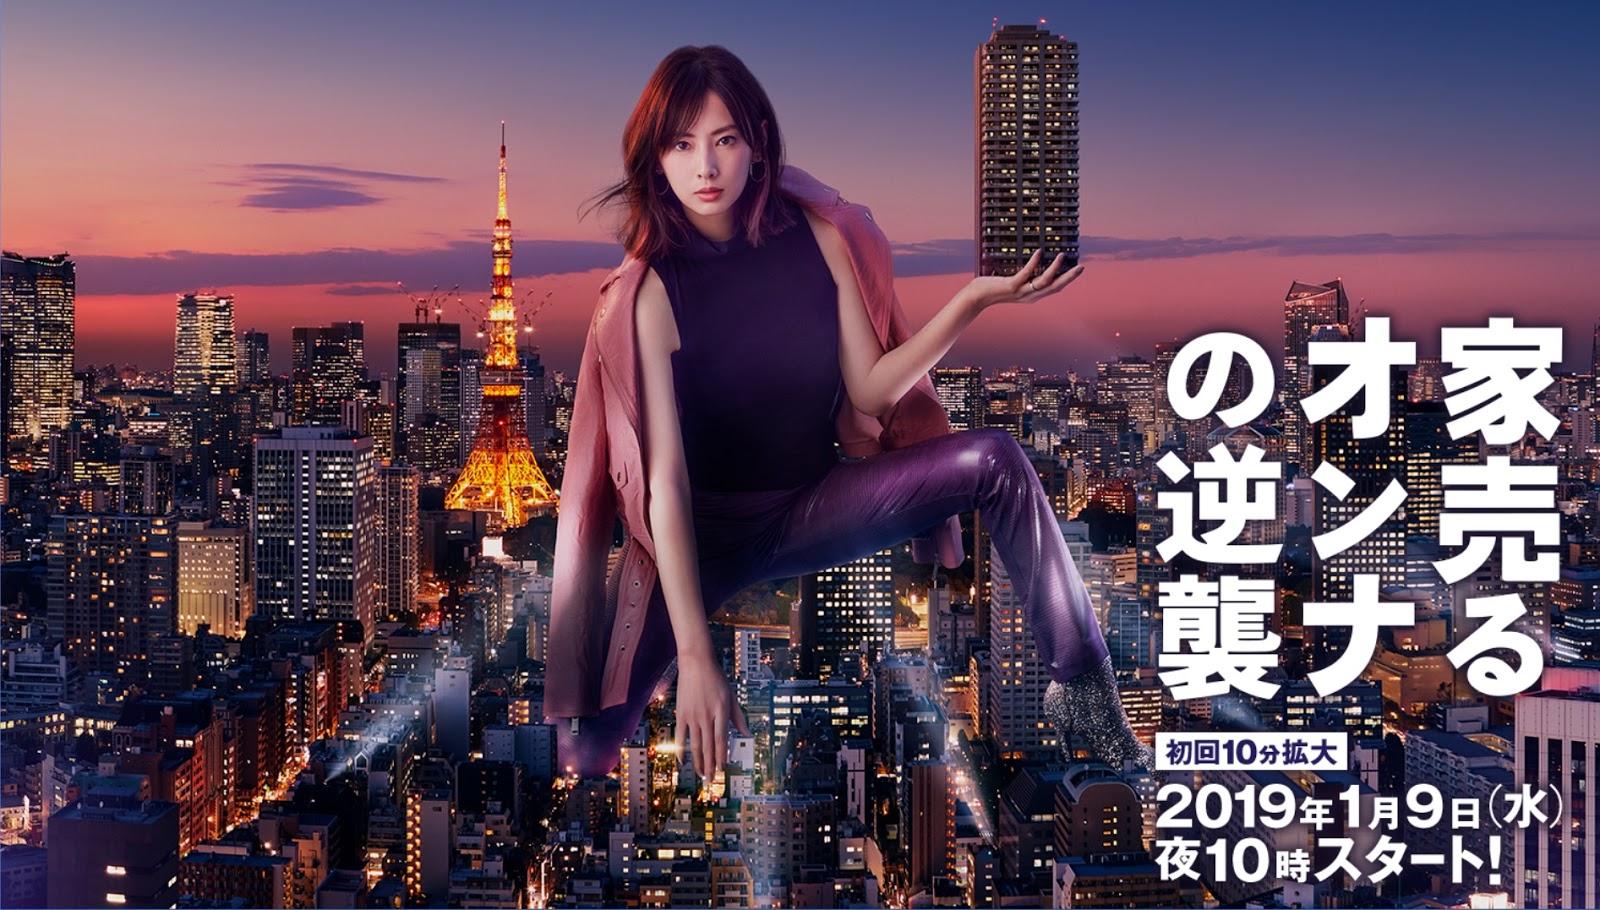 Dorama World: Oricon's most anticipated Winter 2019 dramas ranking